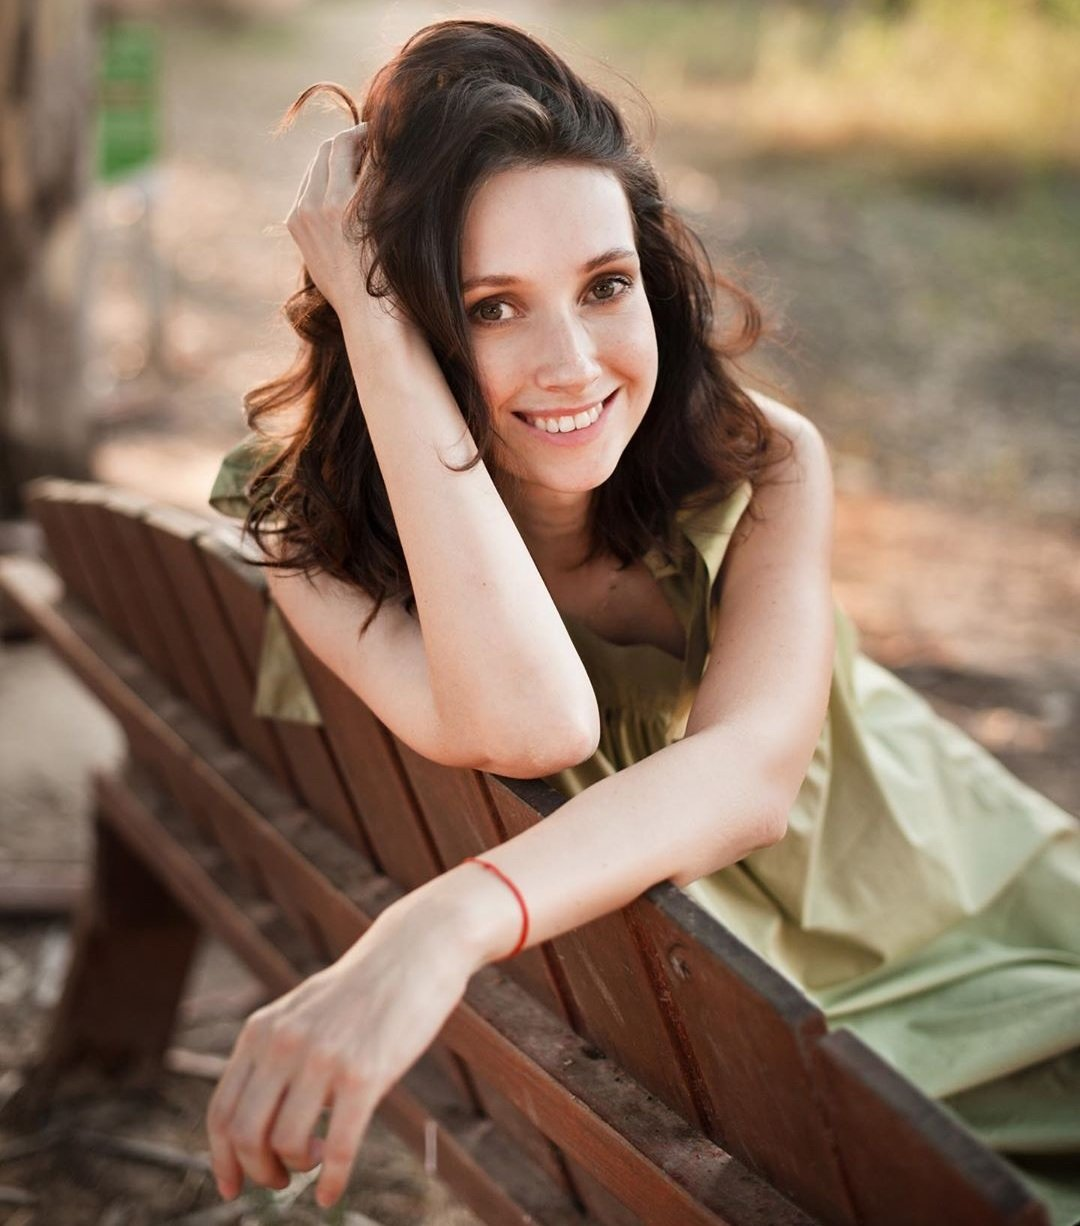 Анастасия Цветаева рассказала, почему отказалась от шеллака